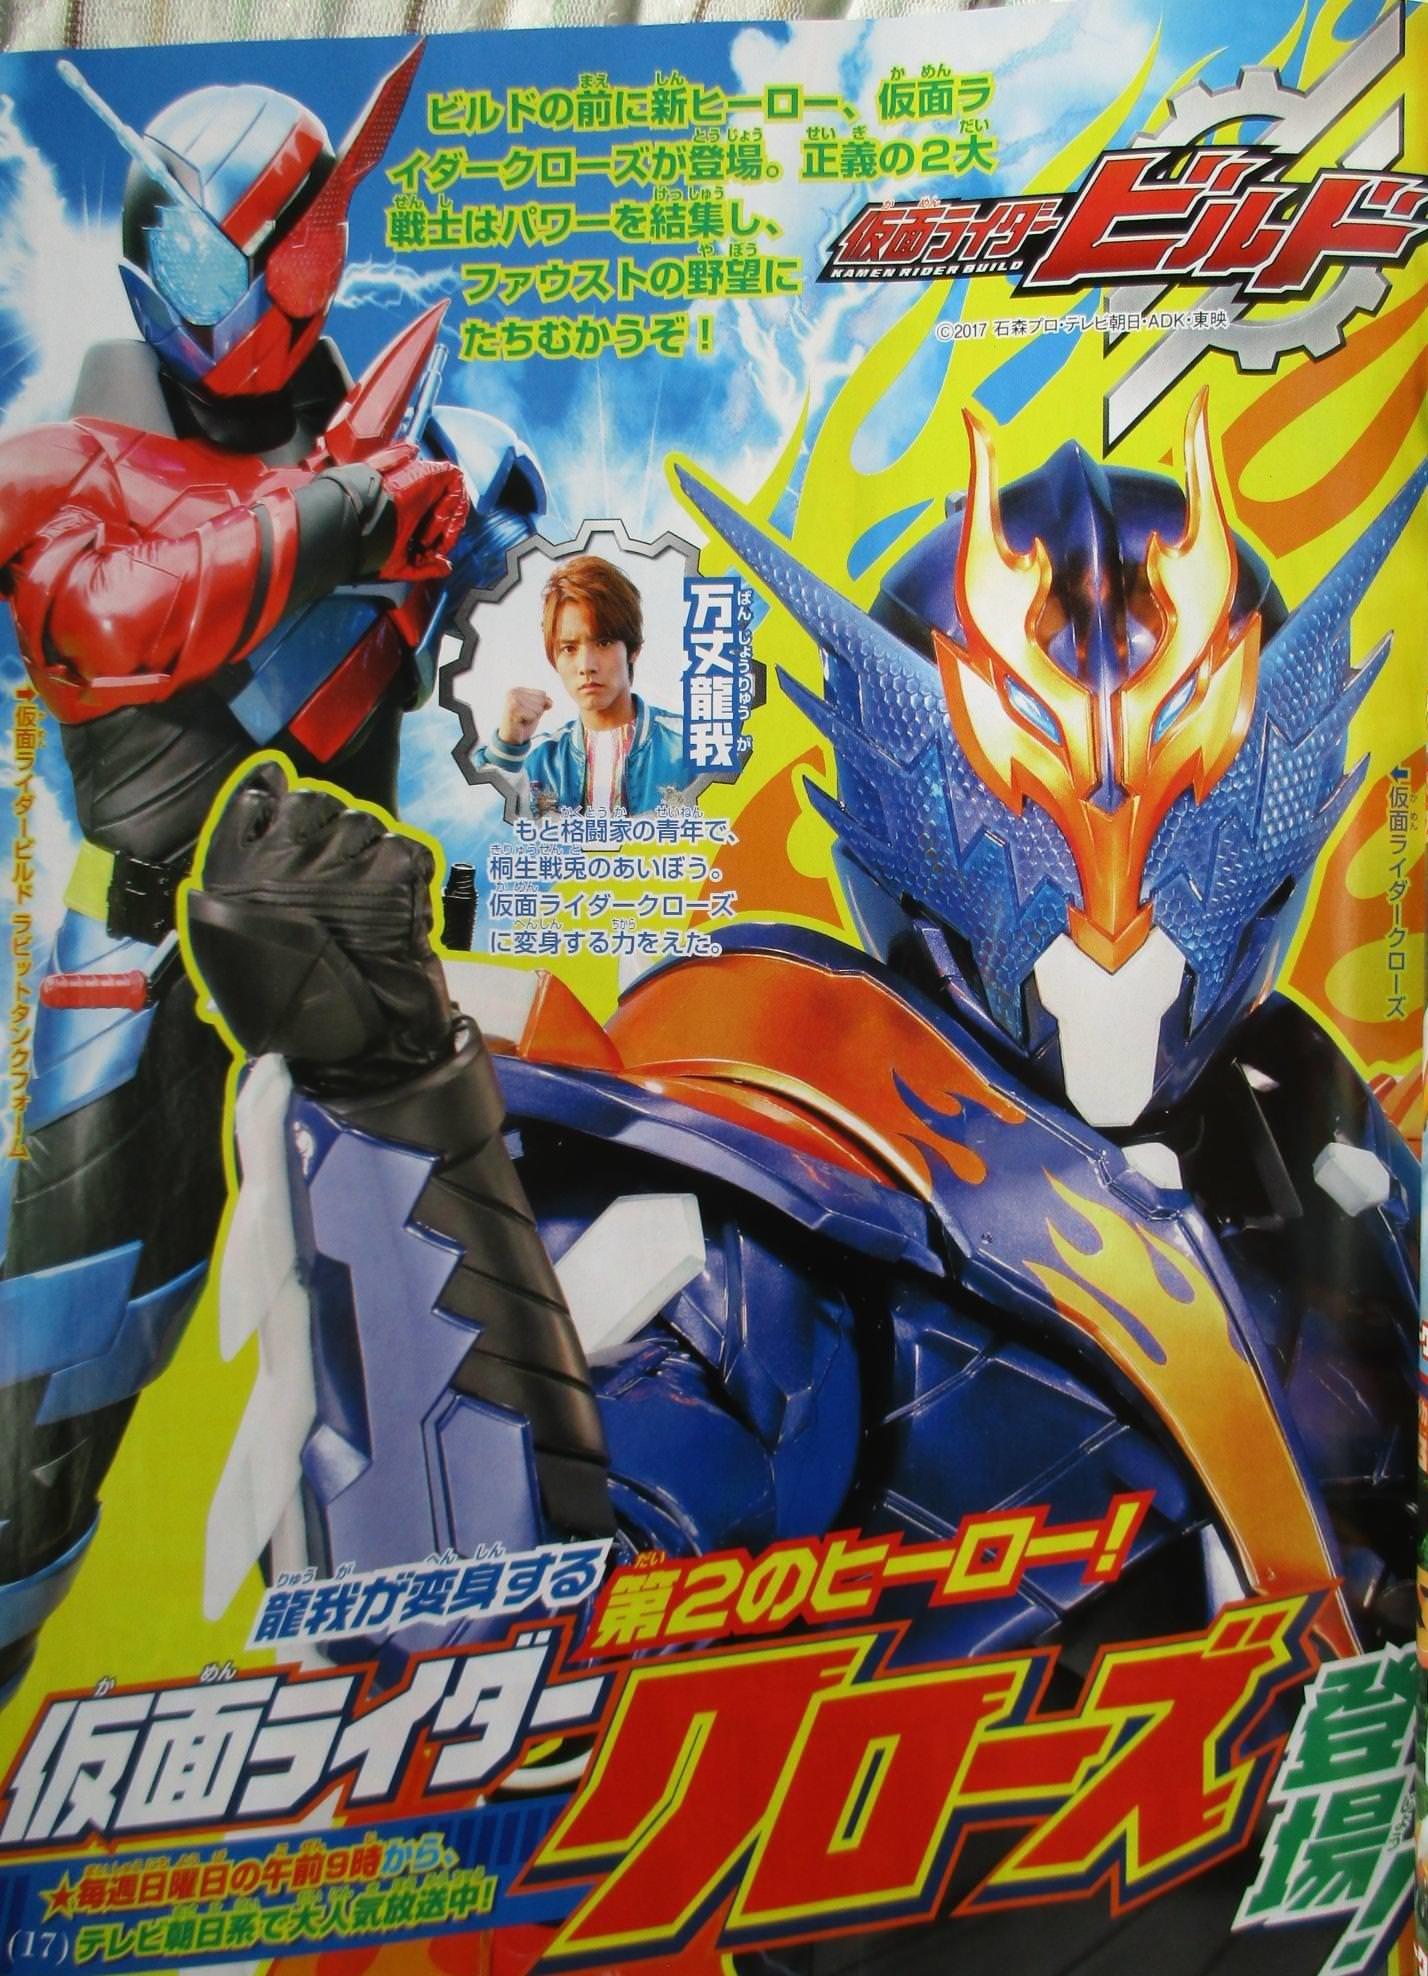 New Kamen Rider Build Scans Online Kamen Rider Cross Z Fully